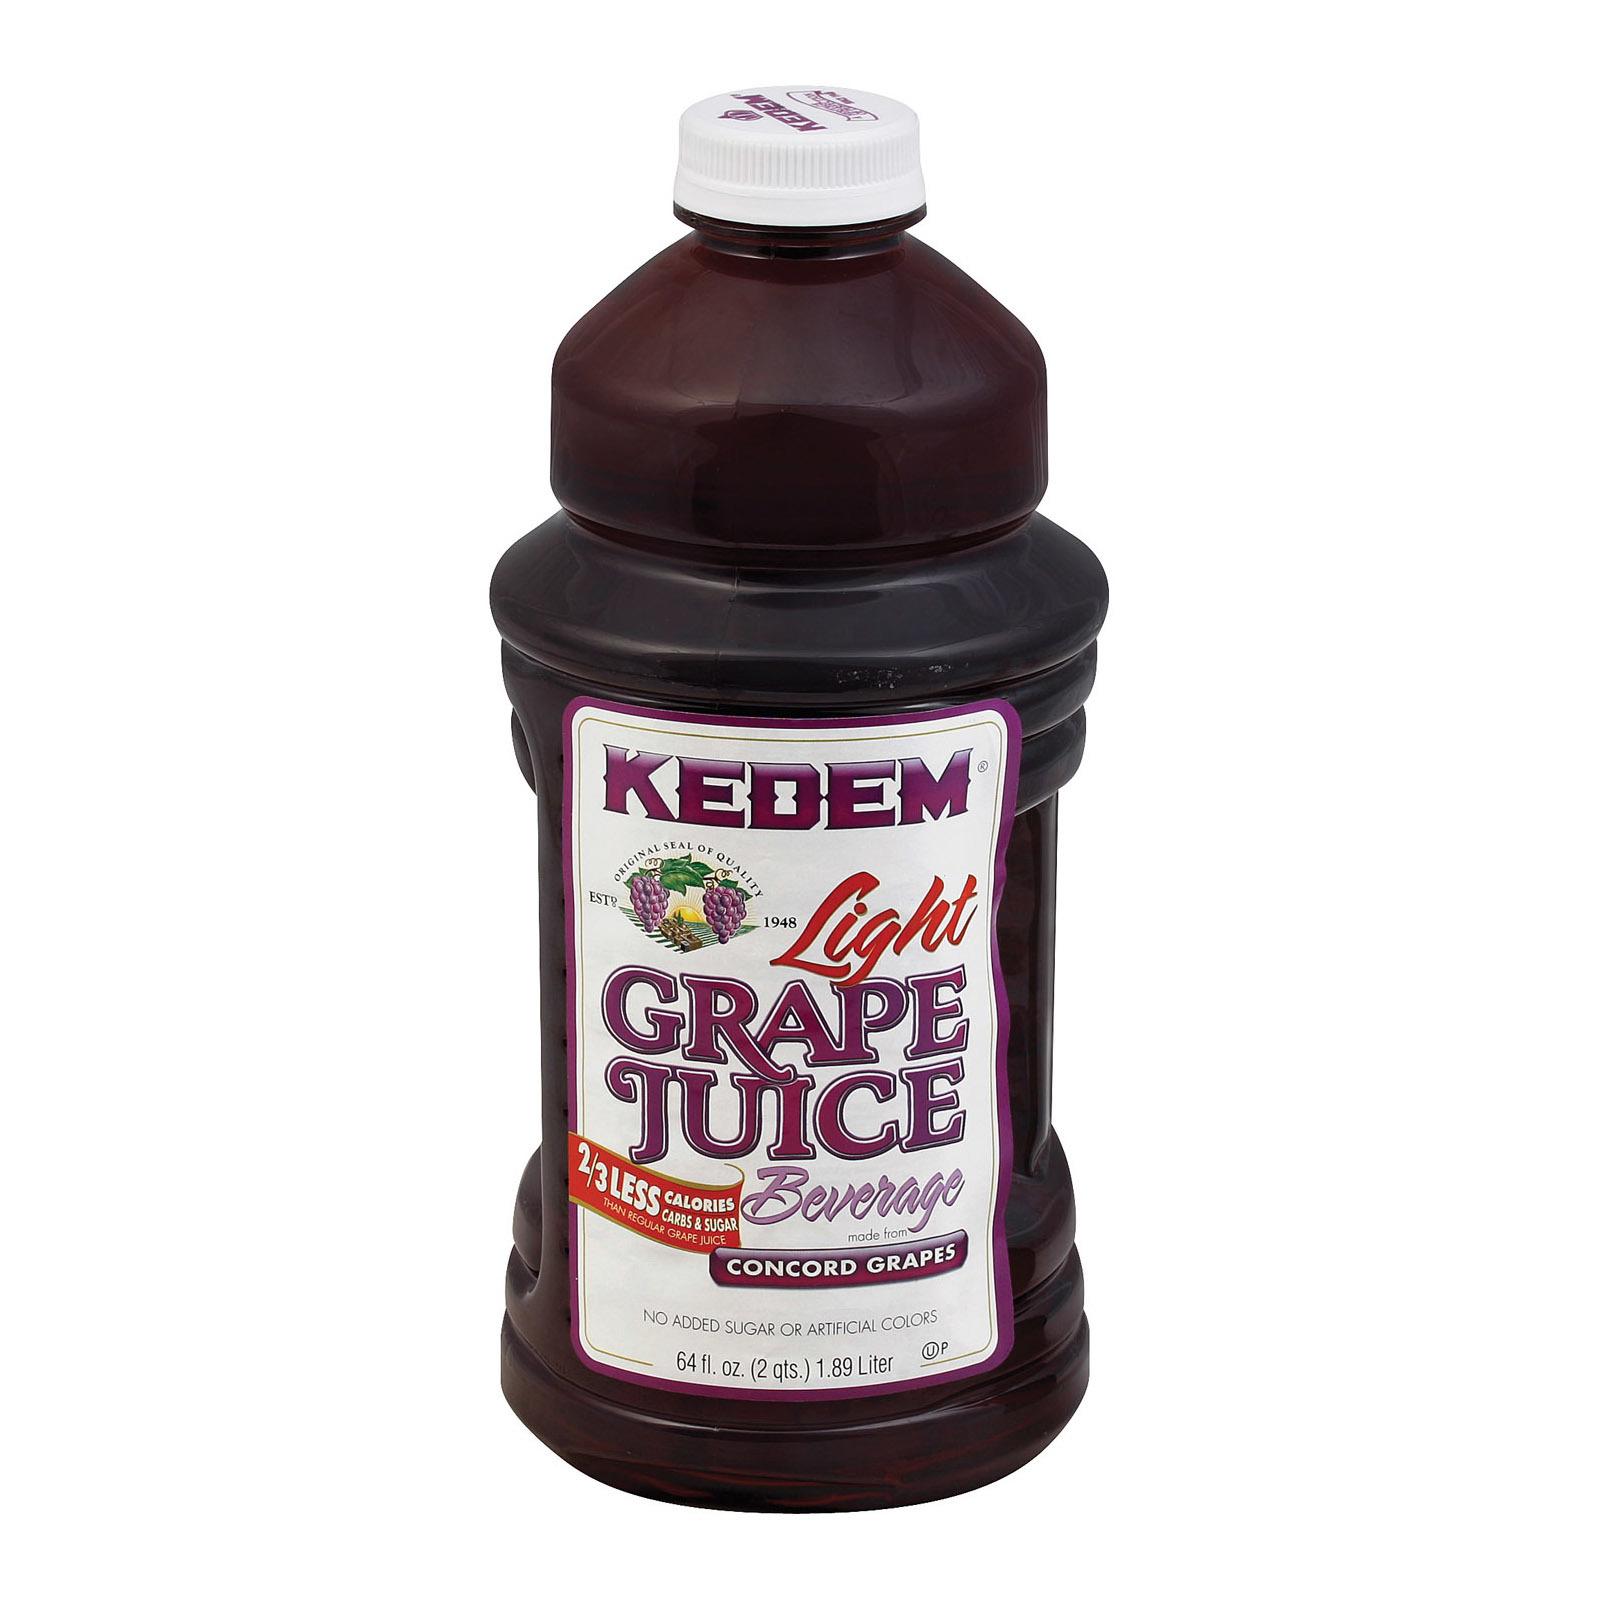 Kedem Lite Grape Juice - Case of 8 - 64 Fl oz.